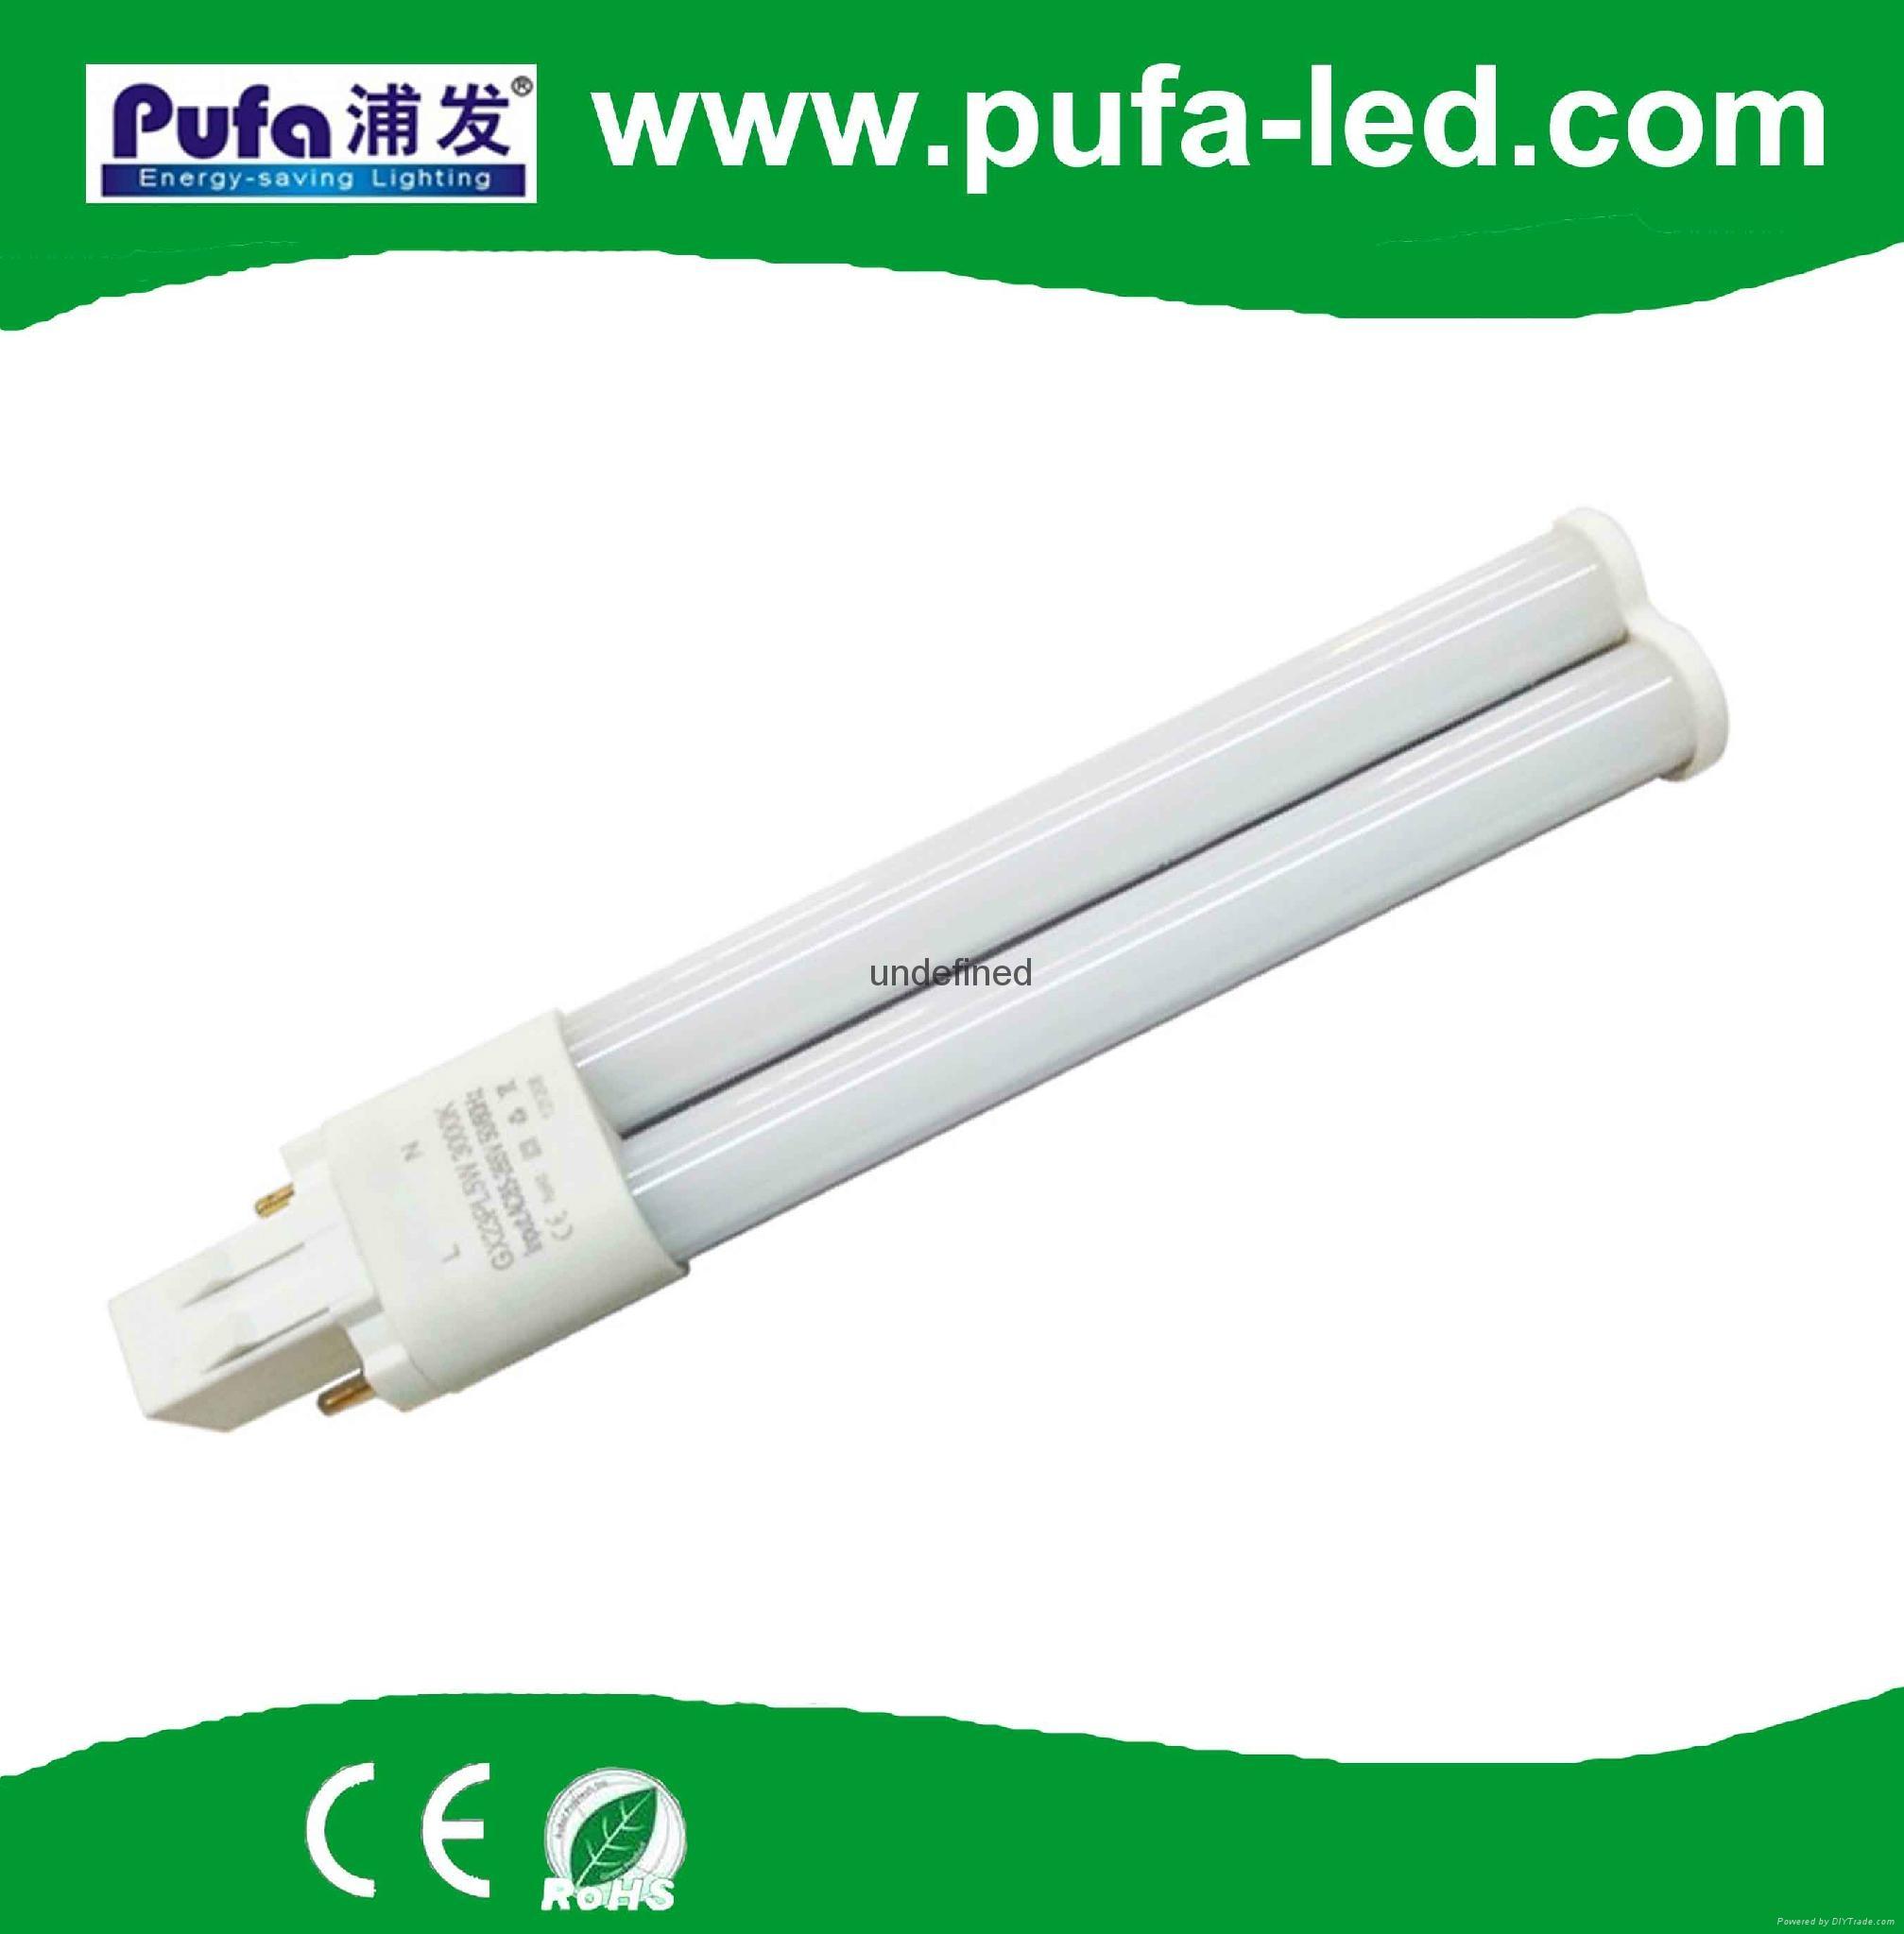 GX23 LED 横插灯 5W 1